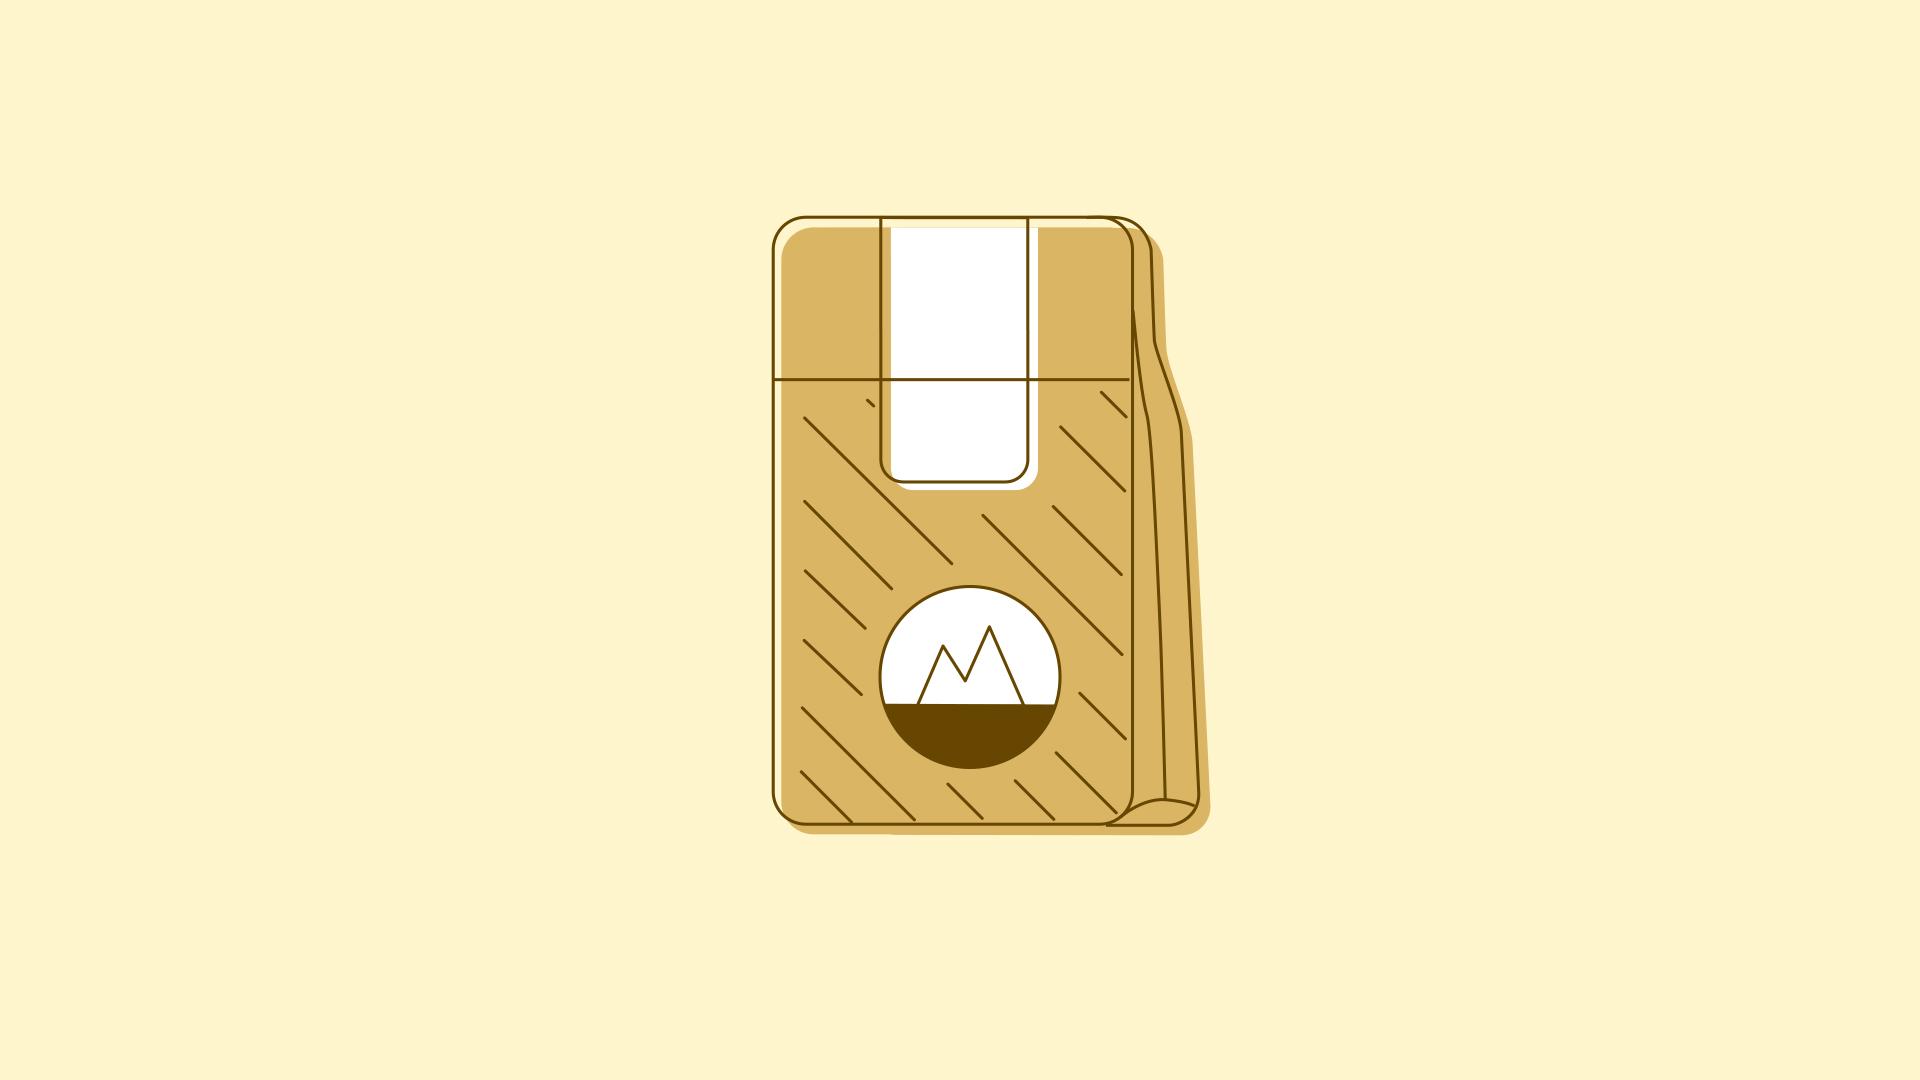 main_comp (0-00-43-18)